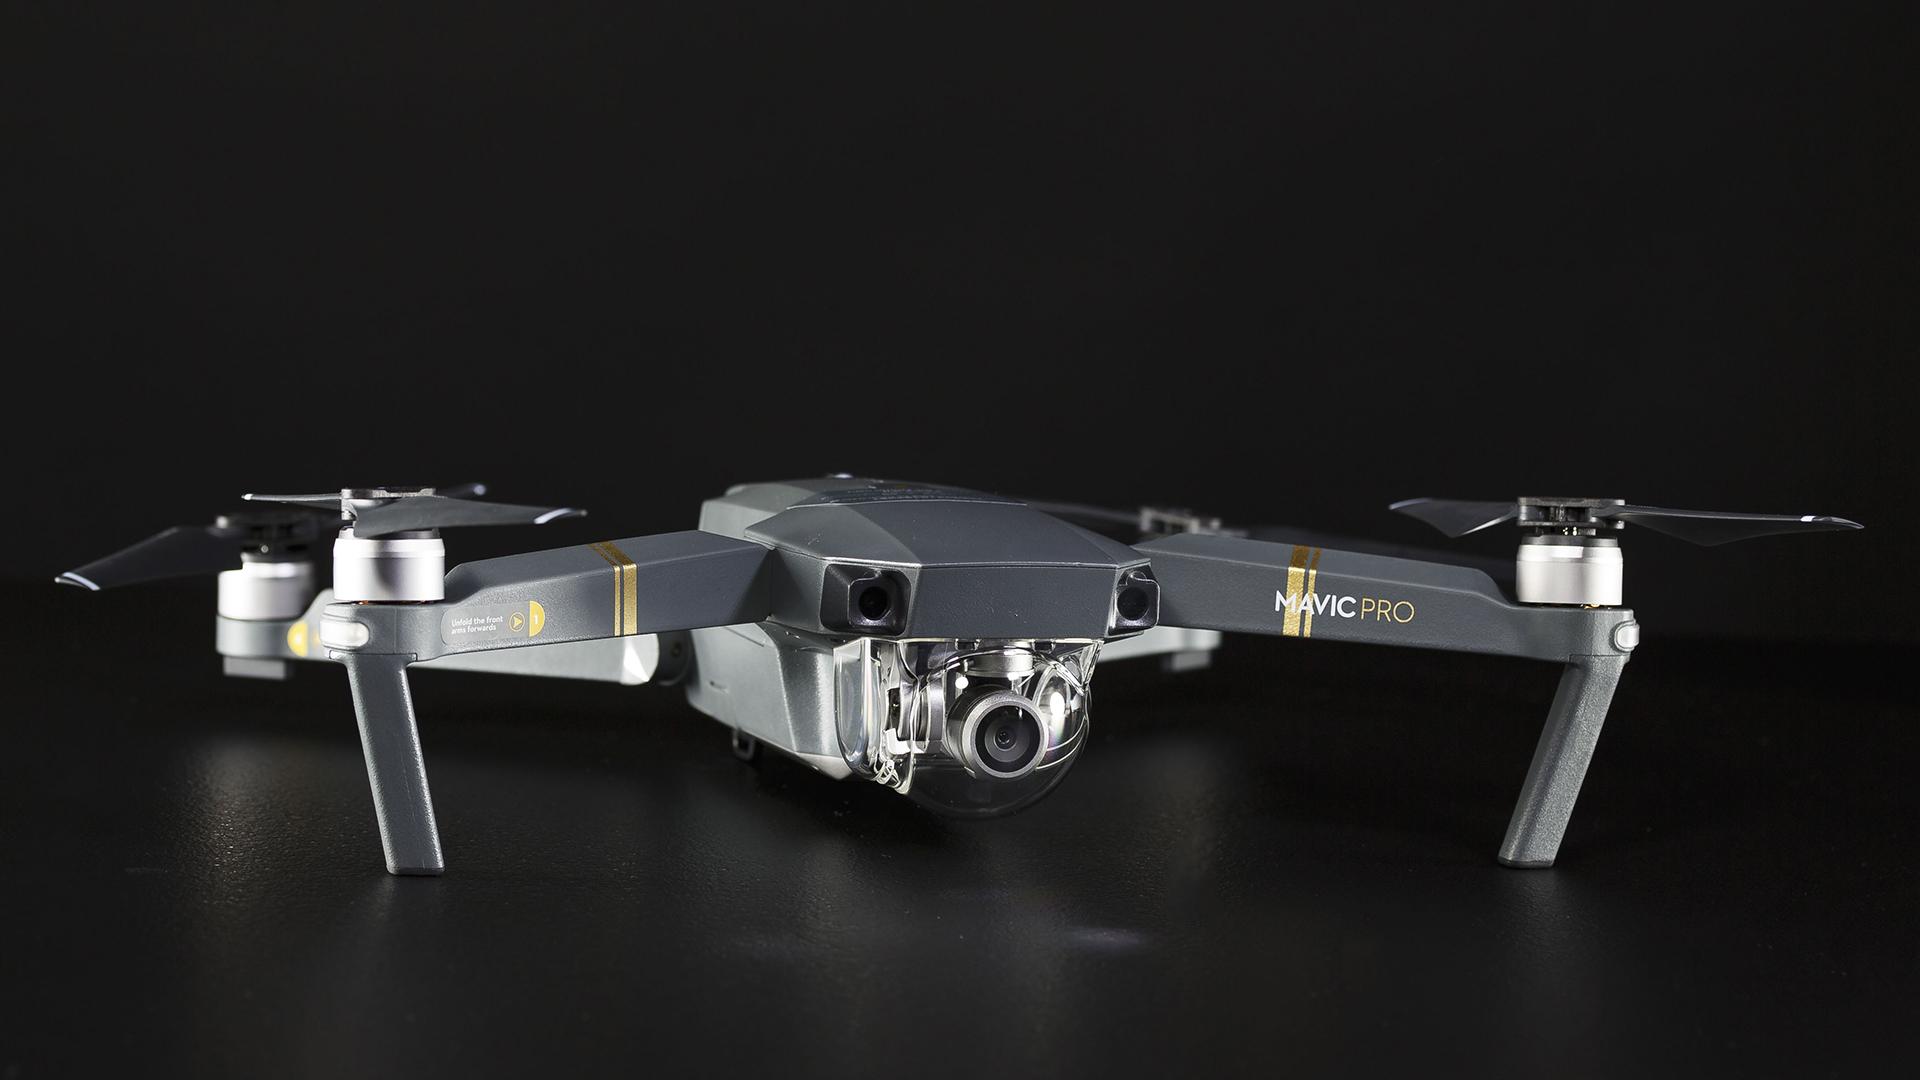 Karbist välja: DJI Mavic Pro Fly More Combo Kit